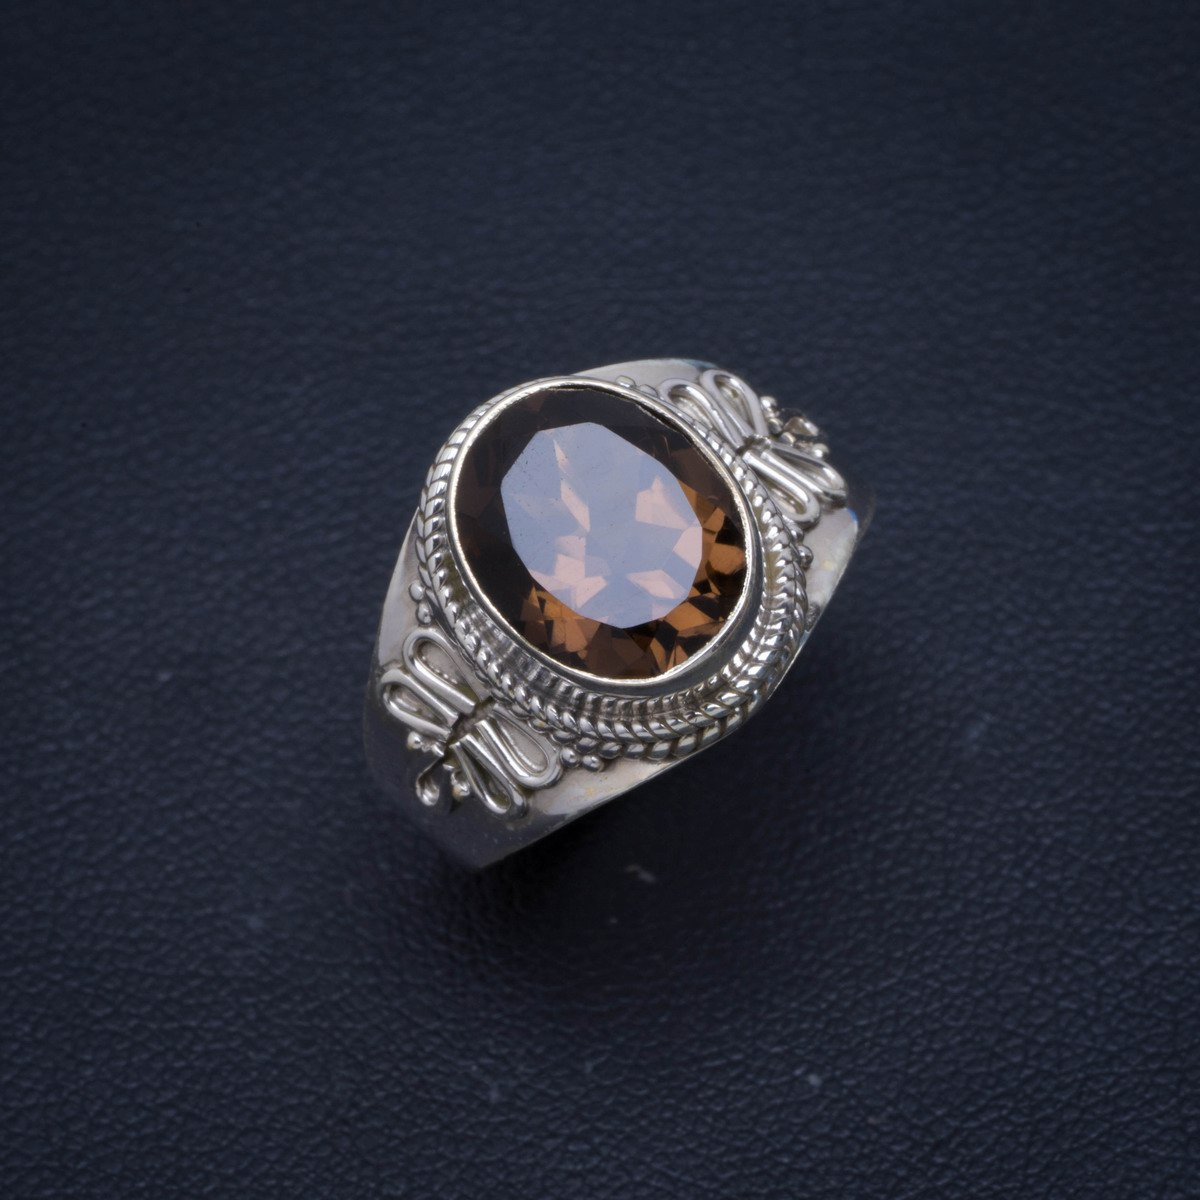 Natural Smoky Quartz Handmade Unique 925 Sterling Silver Ring 9 B1088